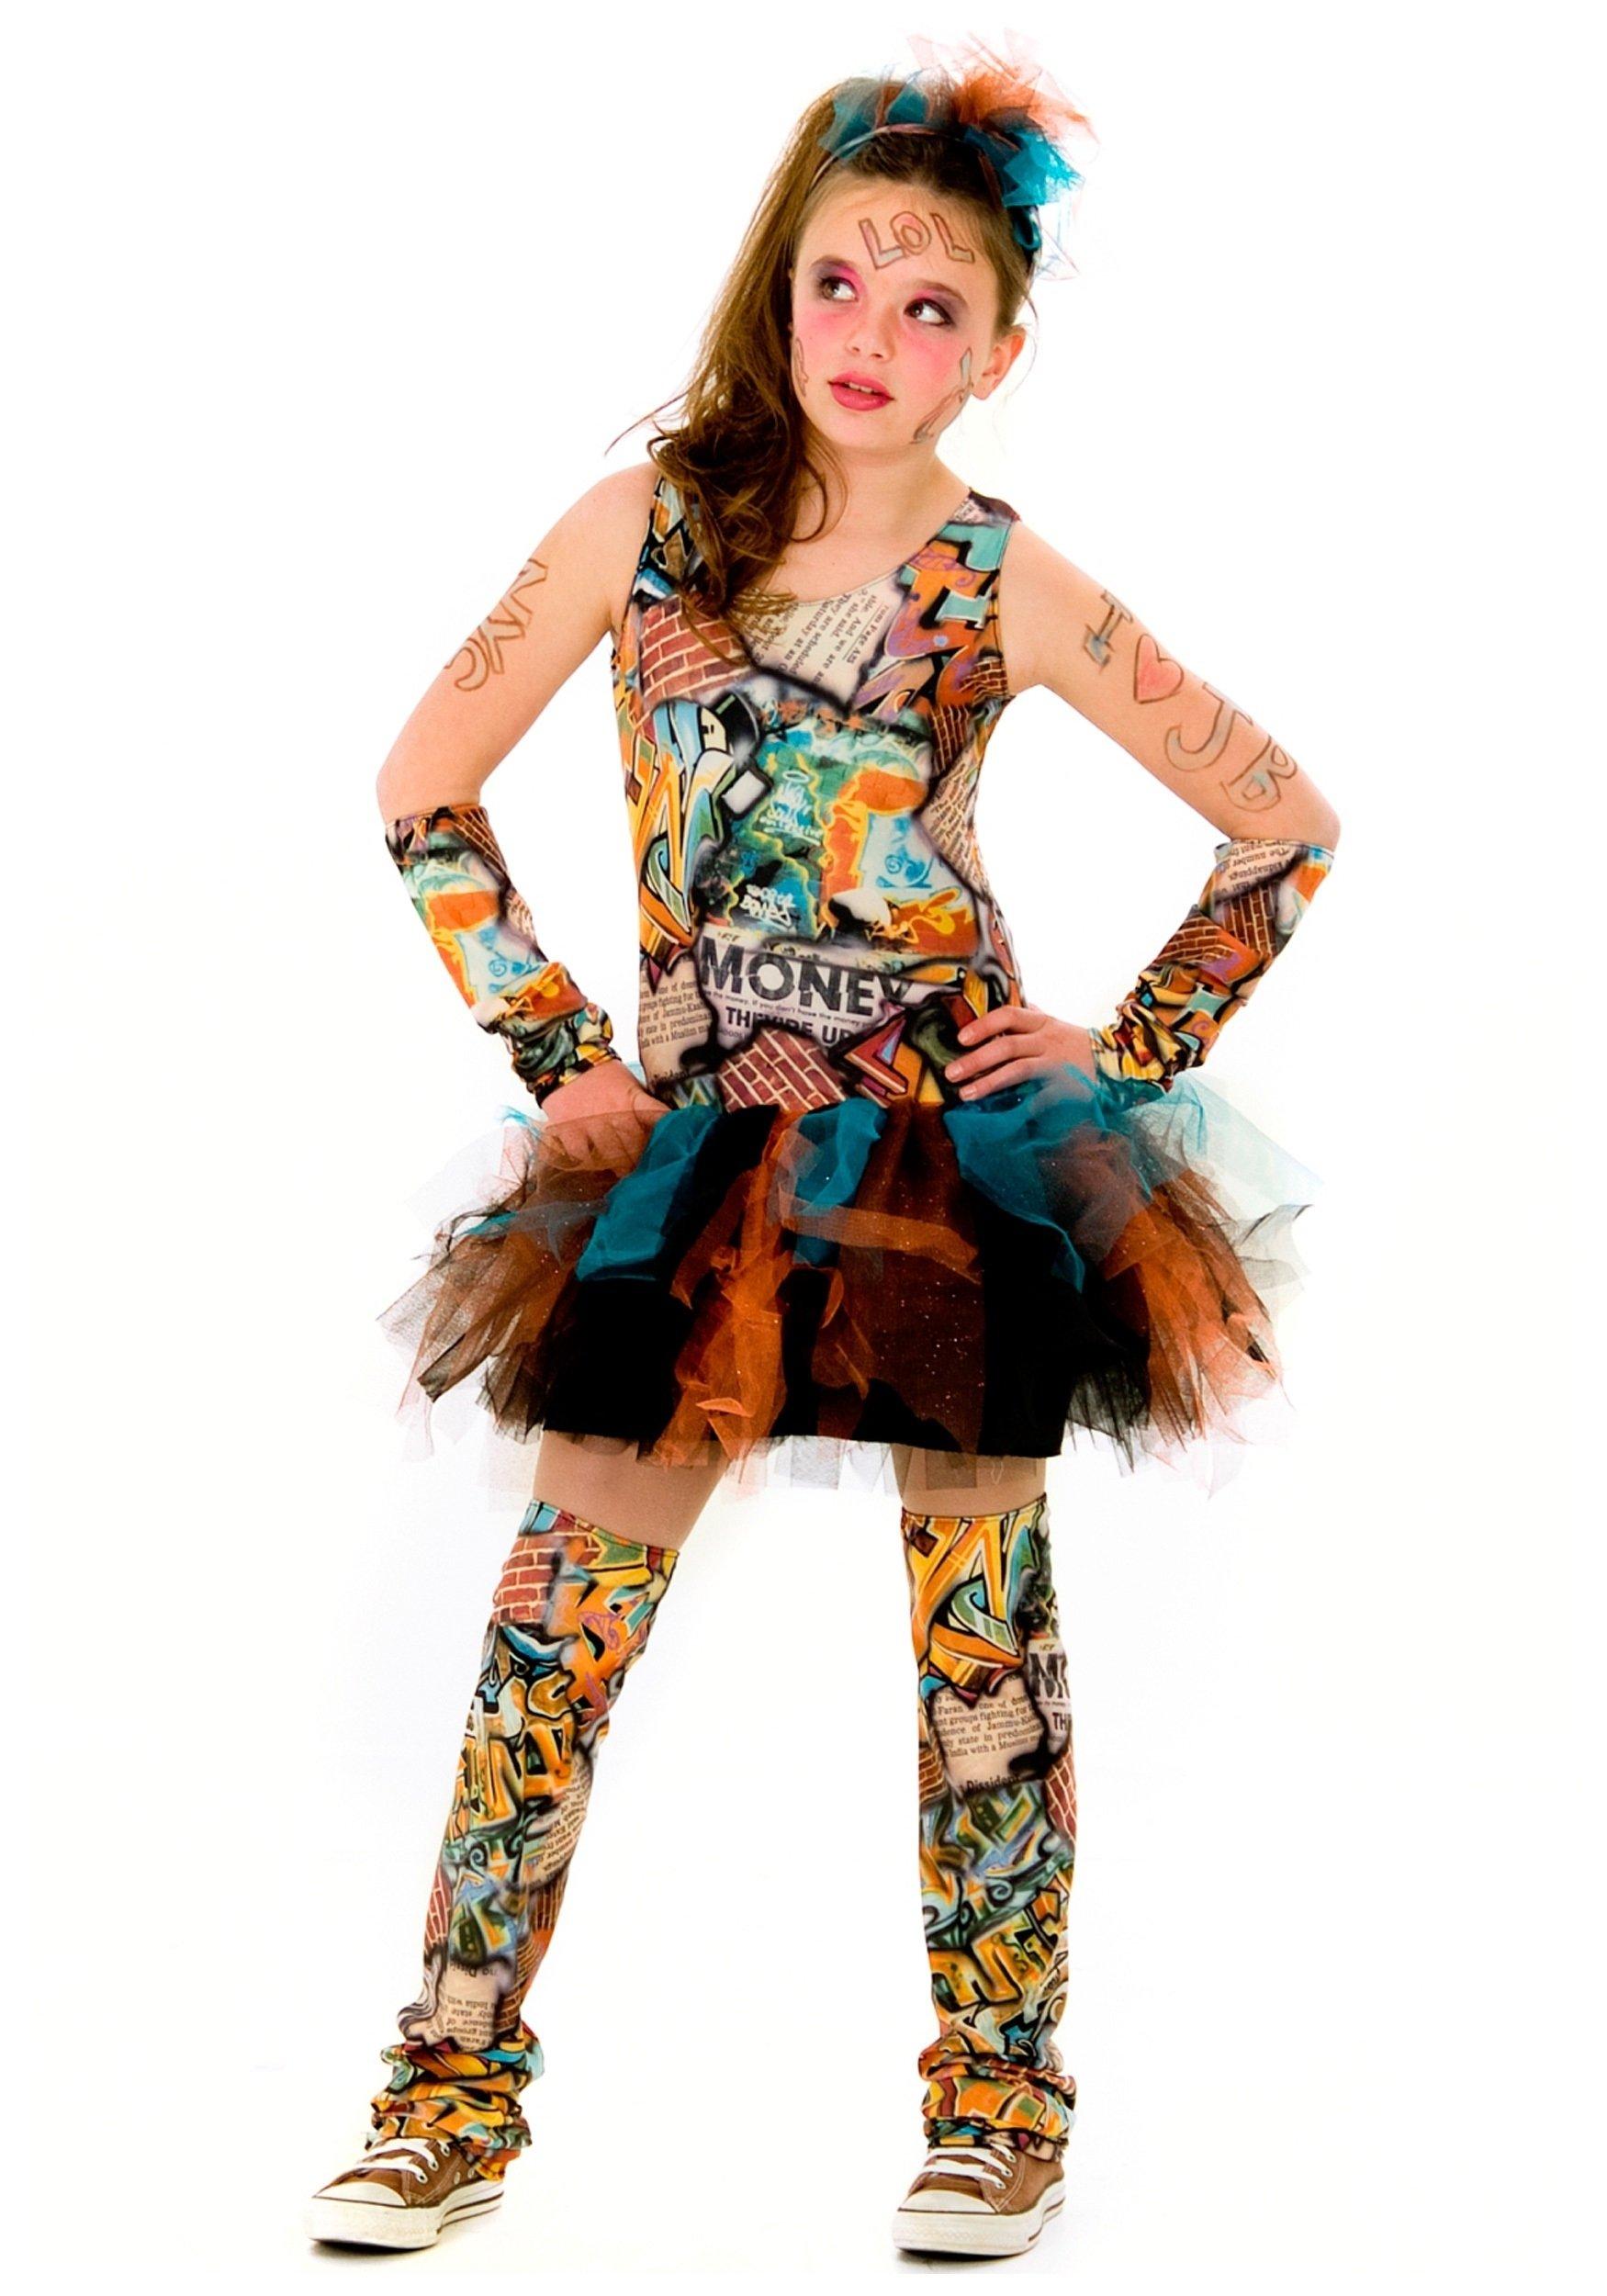 10 Unique Tween Girl Halloween Costume Ideas tween graffiti girl costume unique and colorful teen costumes 2020